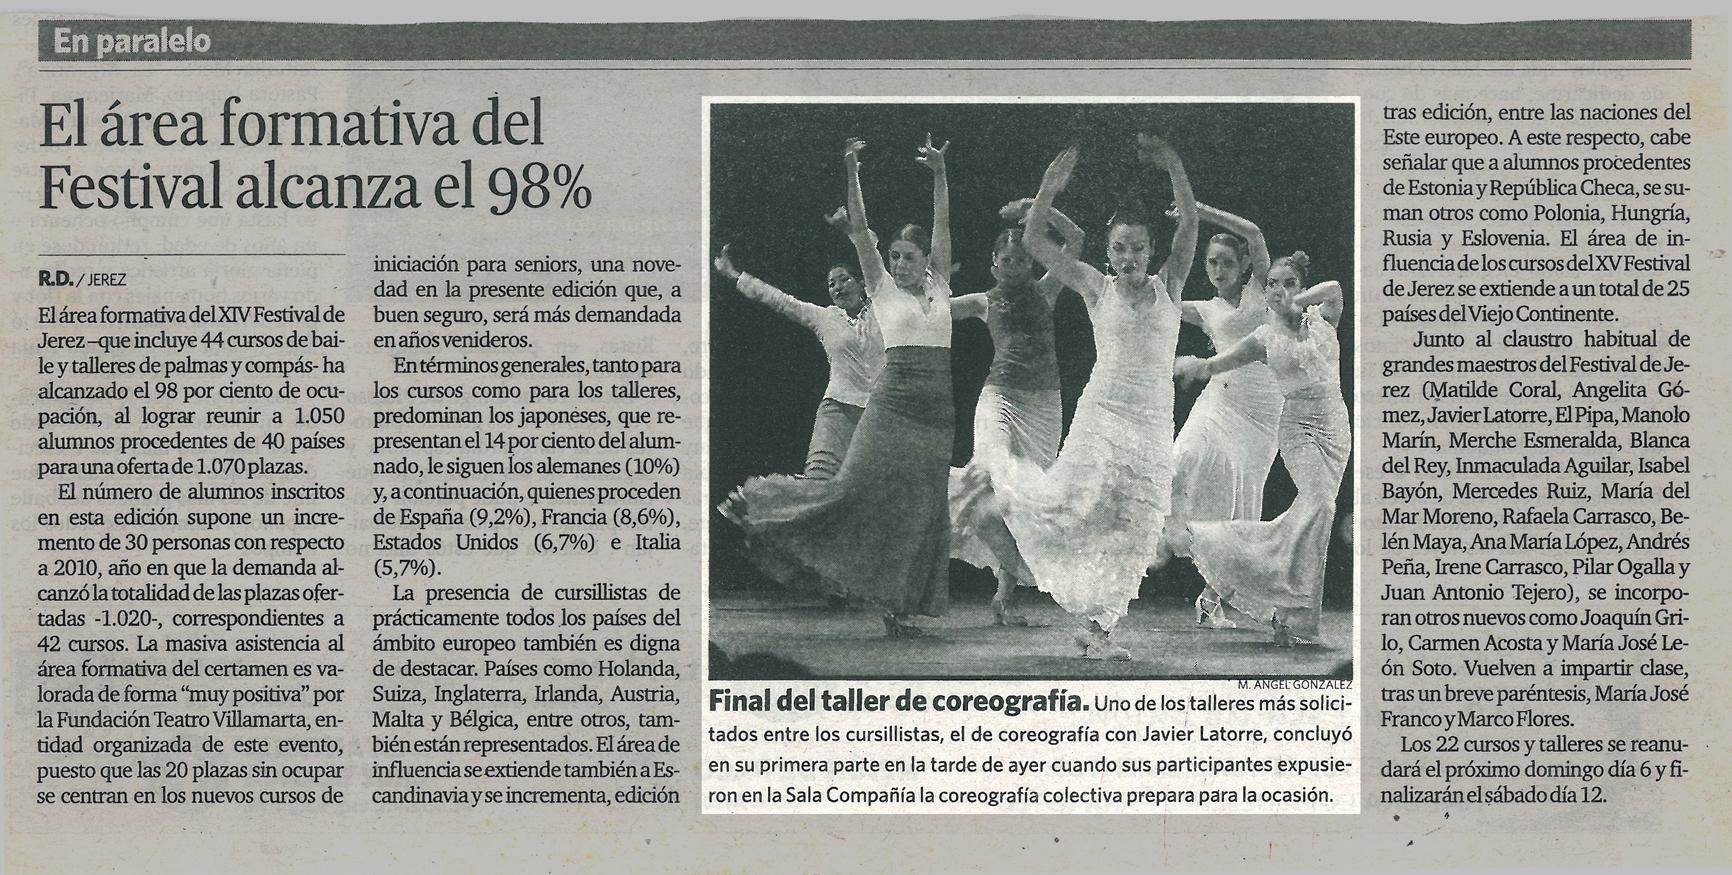 Anamarga_prensa03_1